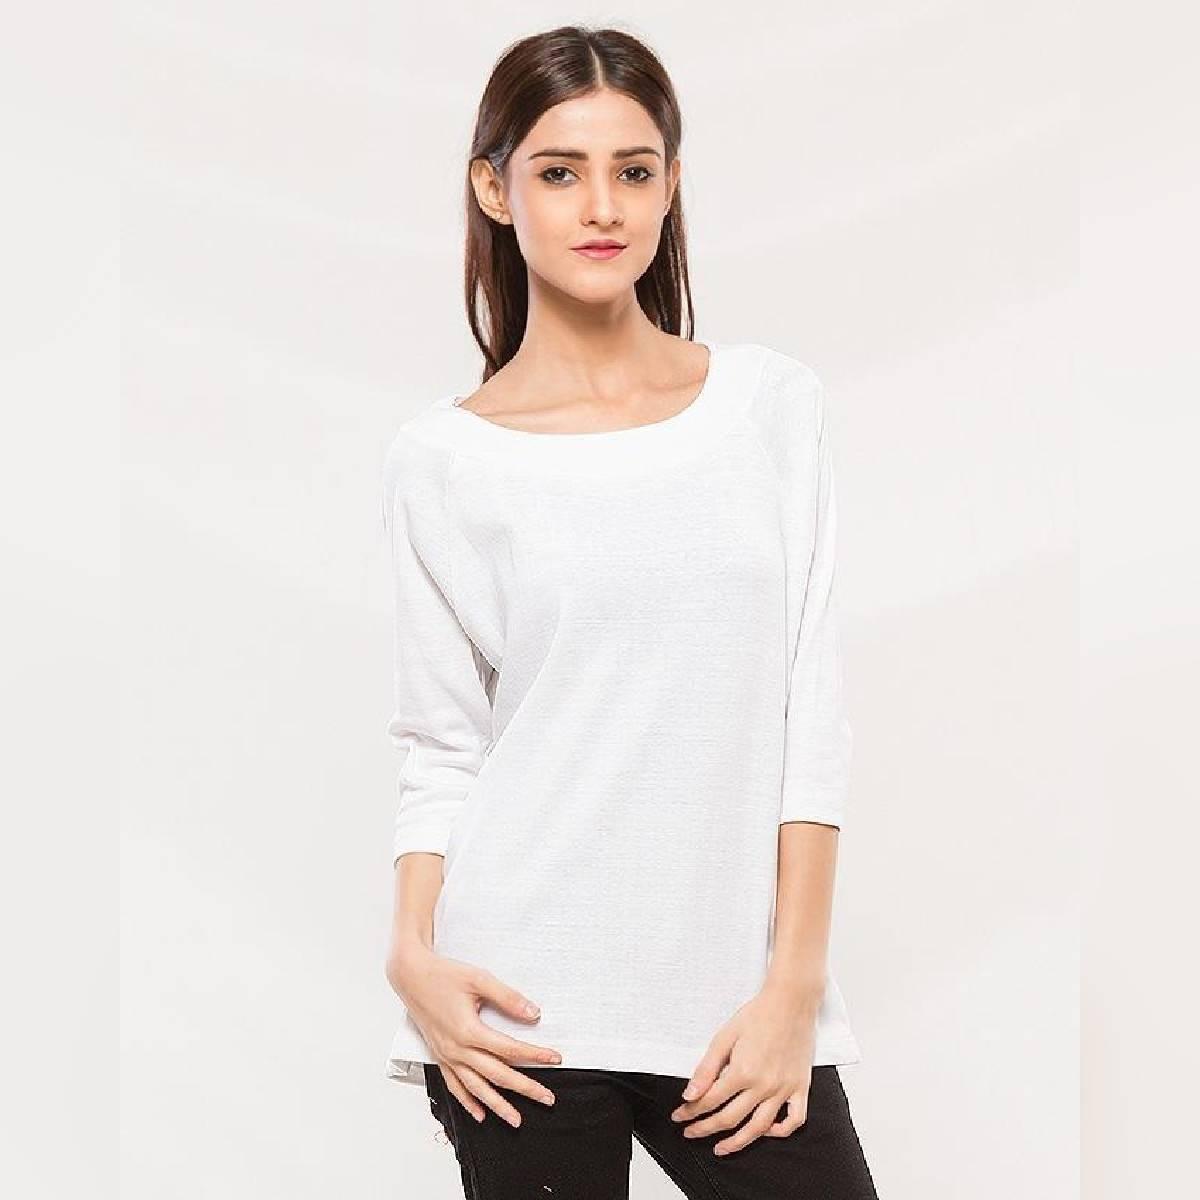 White Cotton Shirt For Women